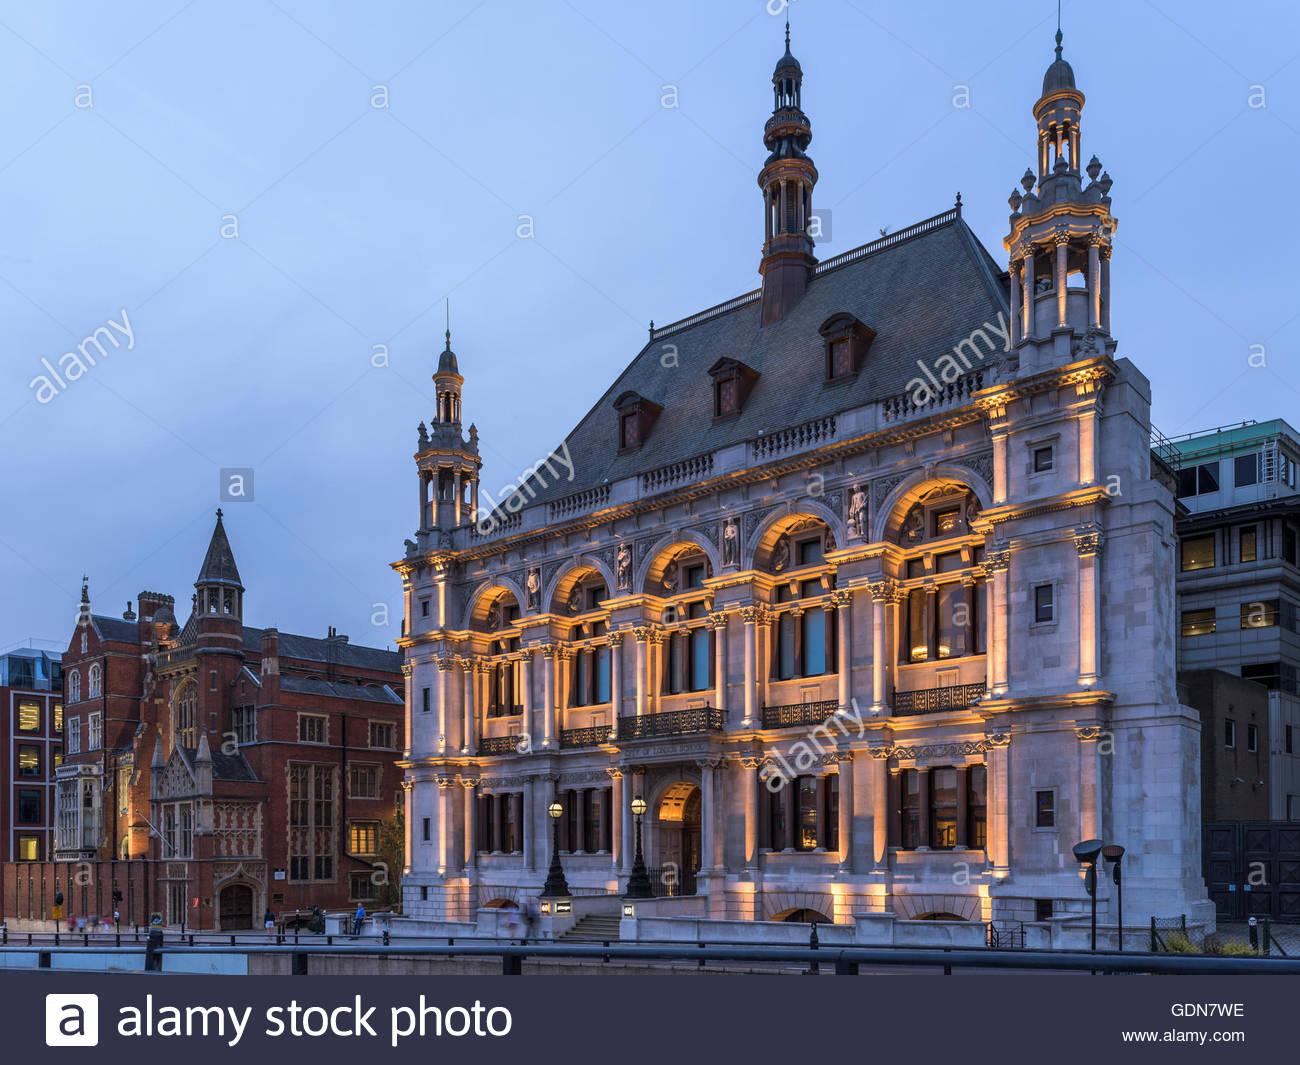 City of London School - Victoria Embankment Building - Stock Image